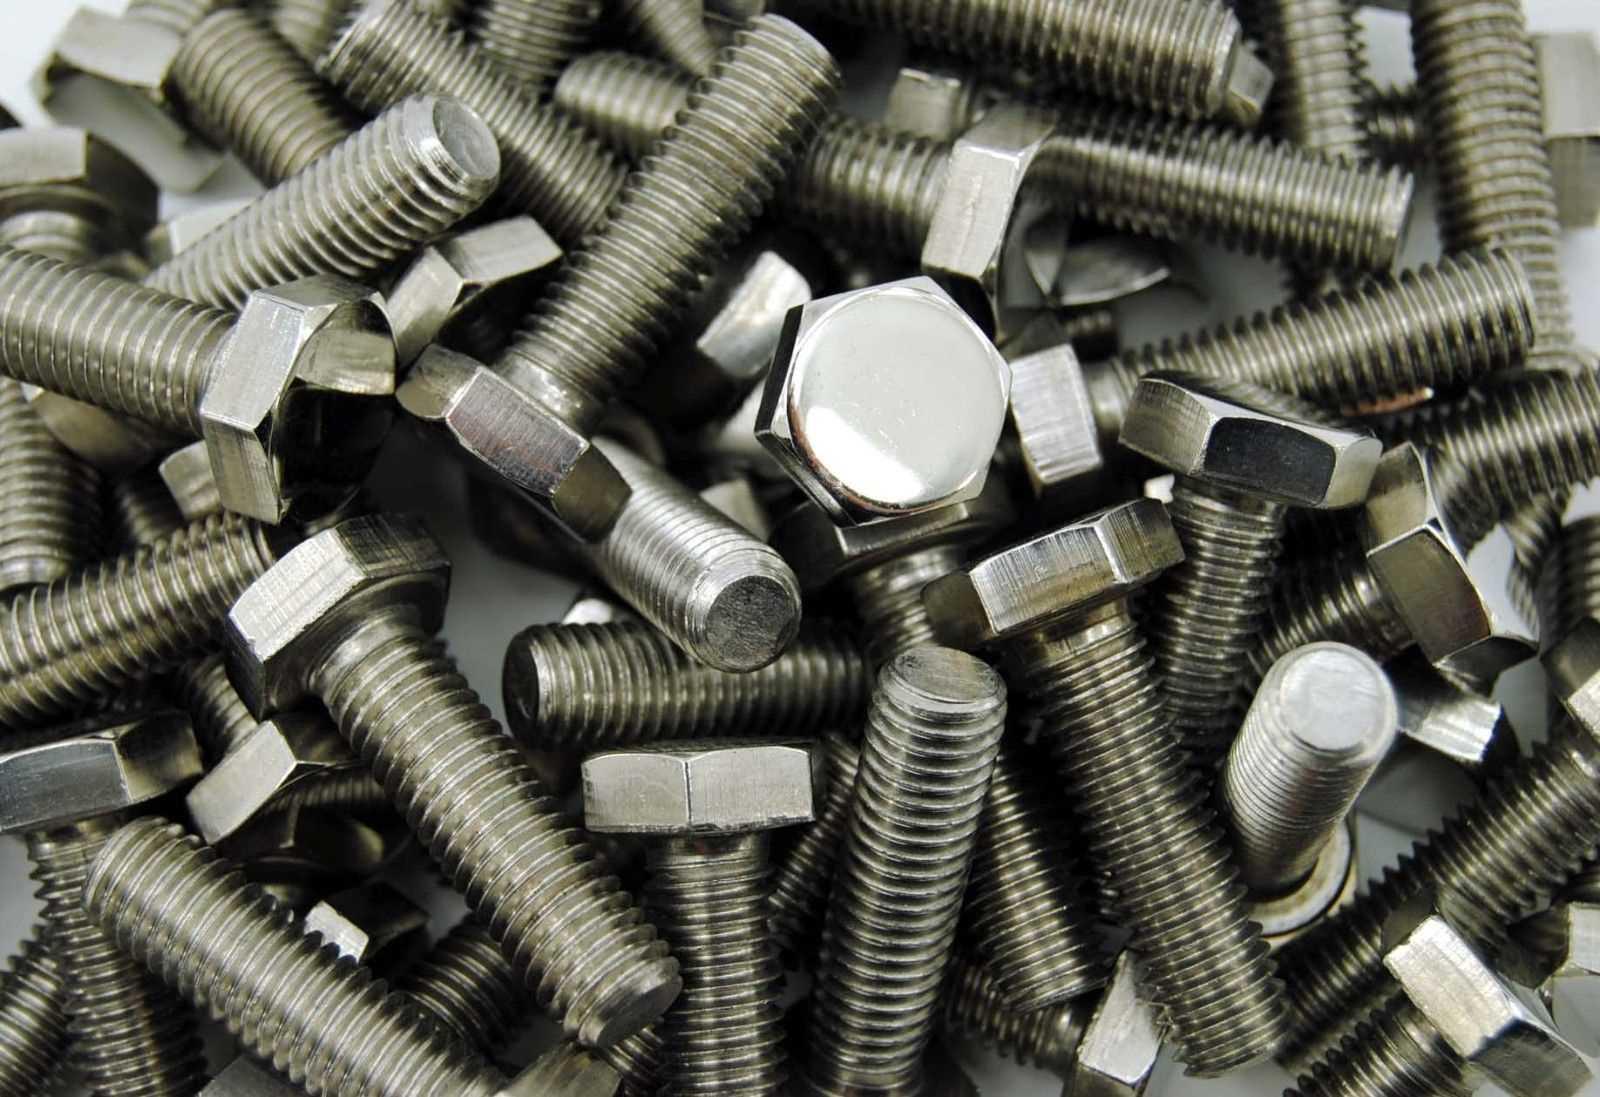 ISO 4017 Sechskantschrauben galvanisch verzinkt 8.8 Foto: Schraube & Mutter 49429 Visbek